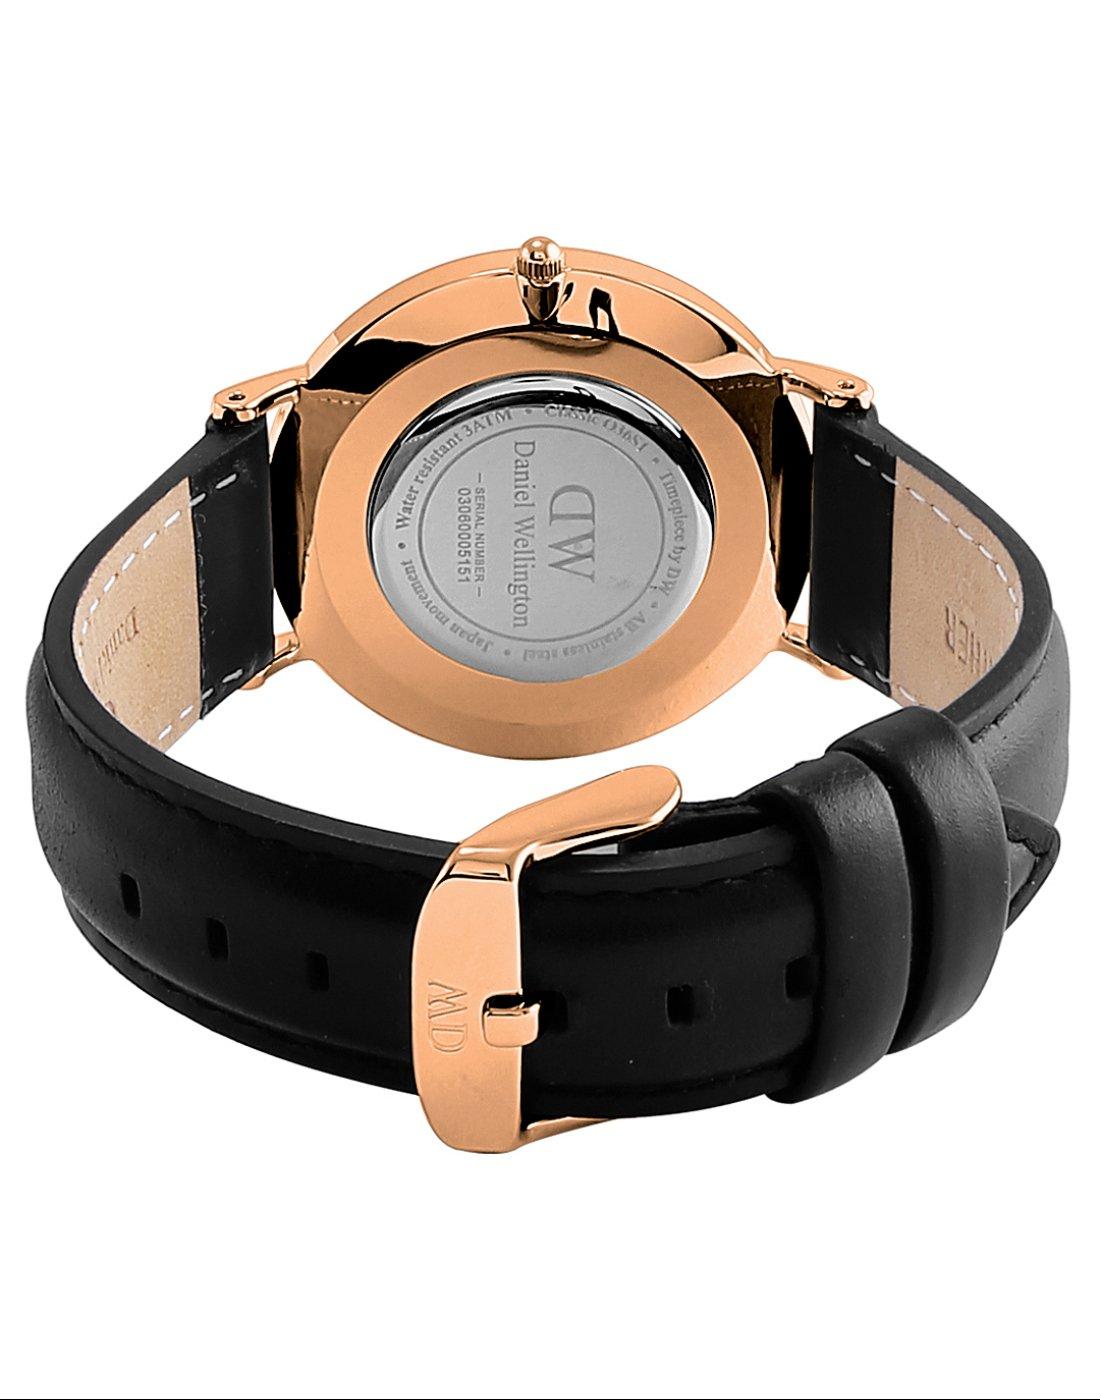 Daniel Wellington Trenduhren  Petite Ashfield, Schwarz/Roségold Uhr, 28mm, Mesh, für Damen